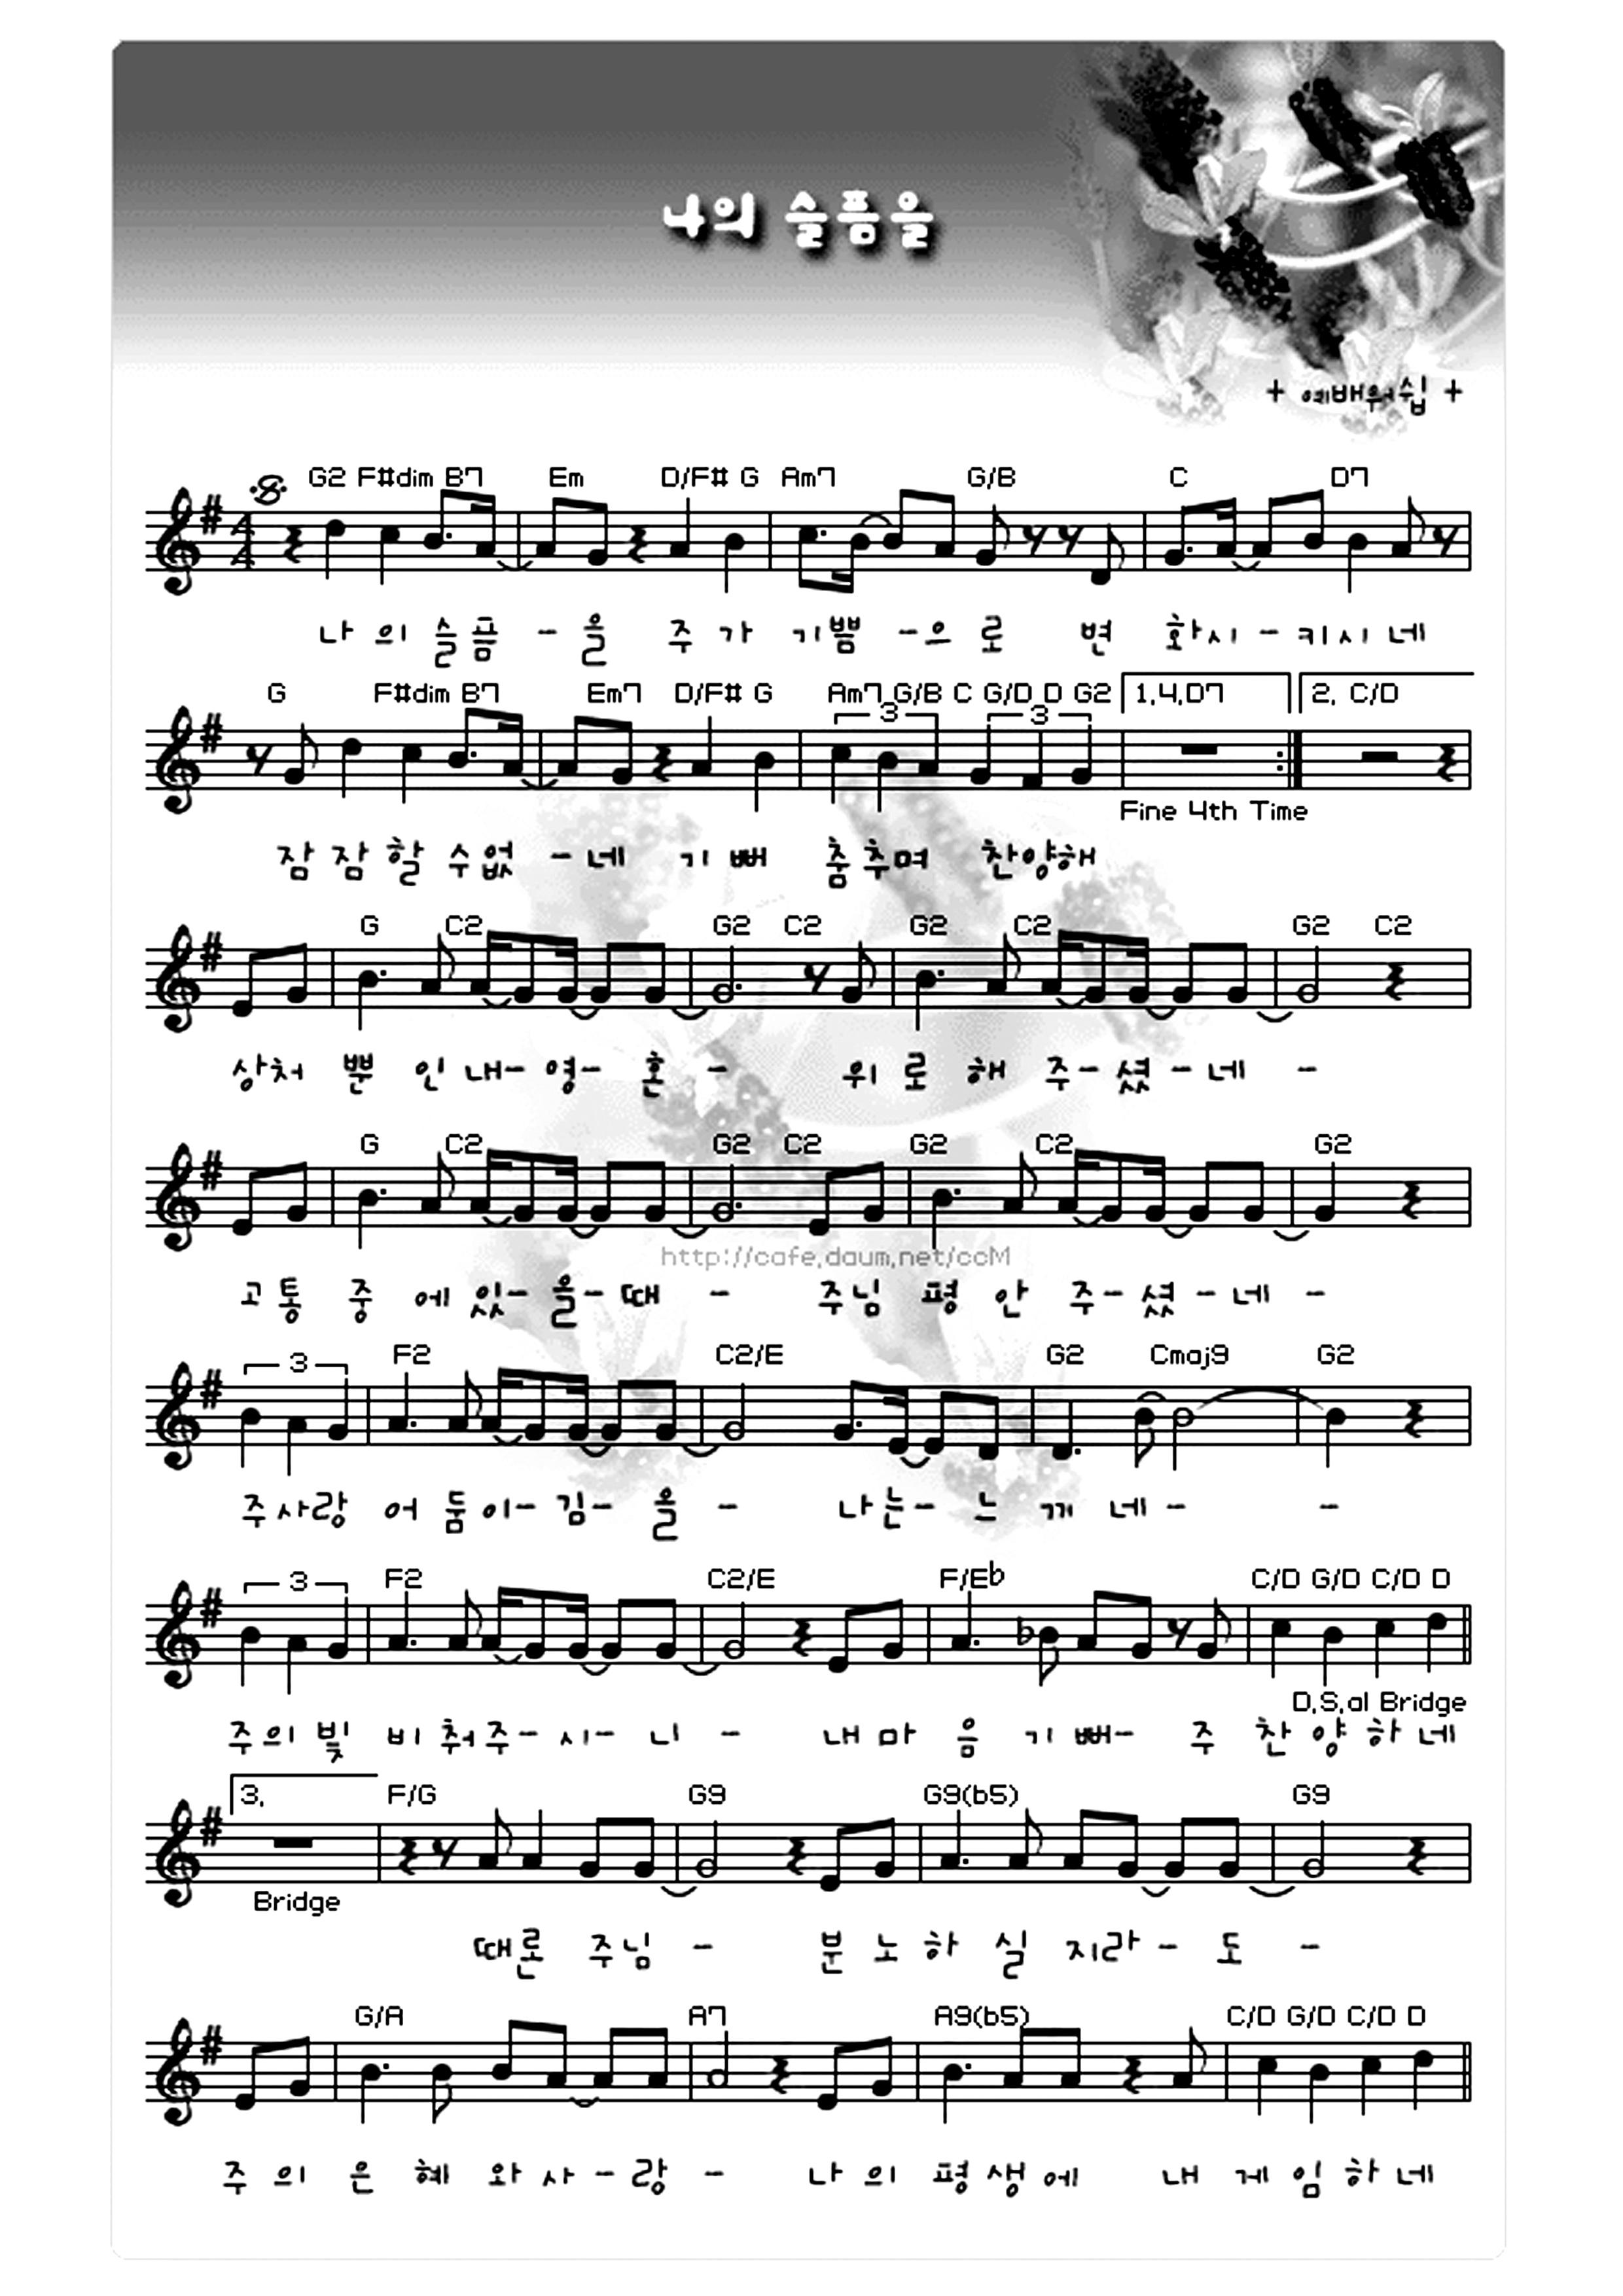 Binaries Trading My Sorrows Lyrics Lincoln Disteheadras Diary